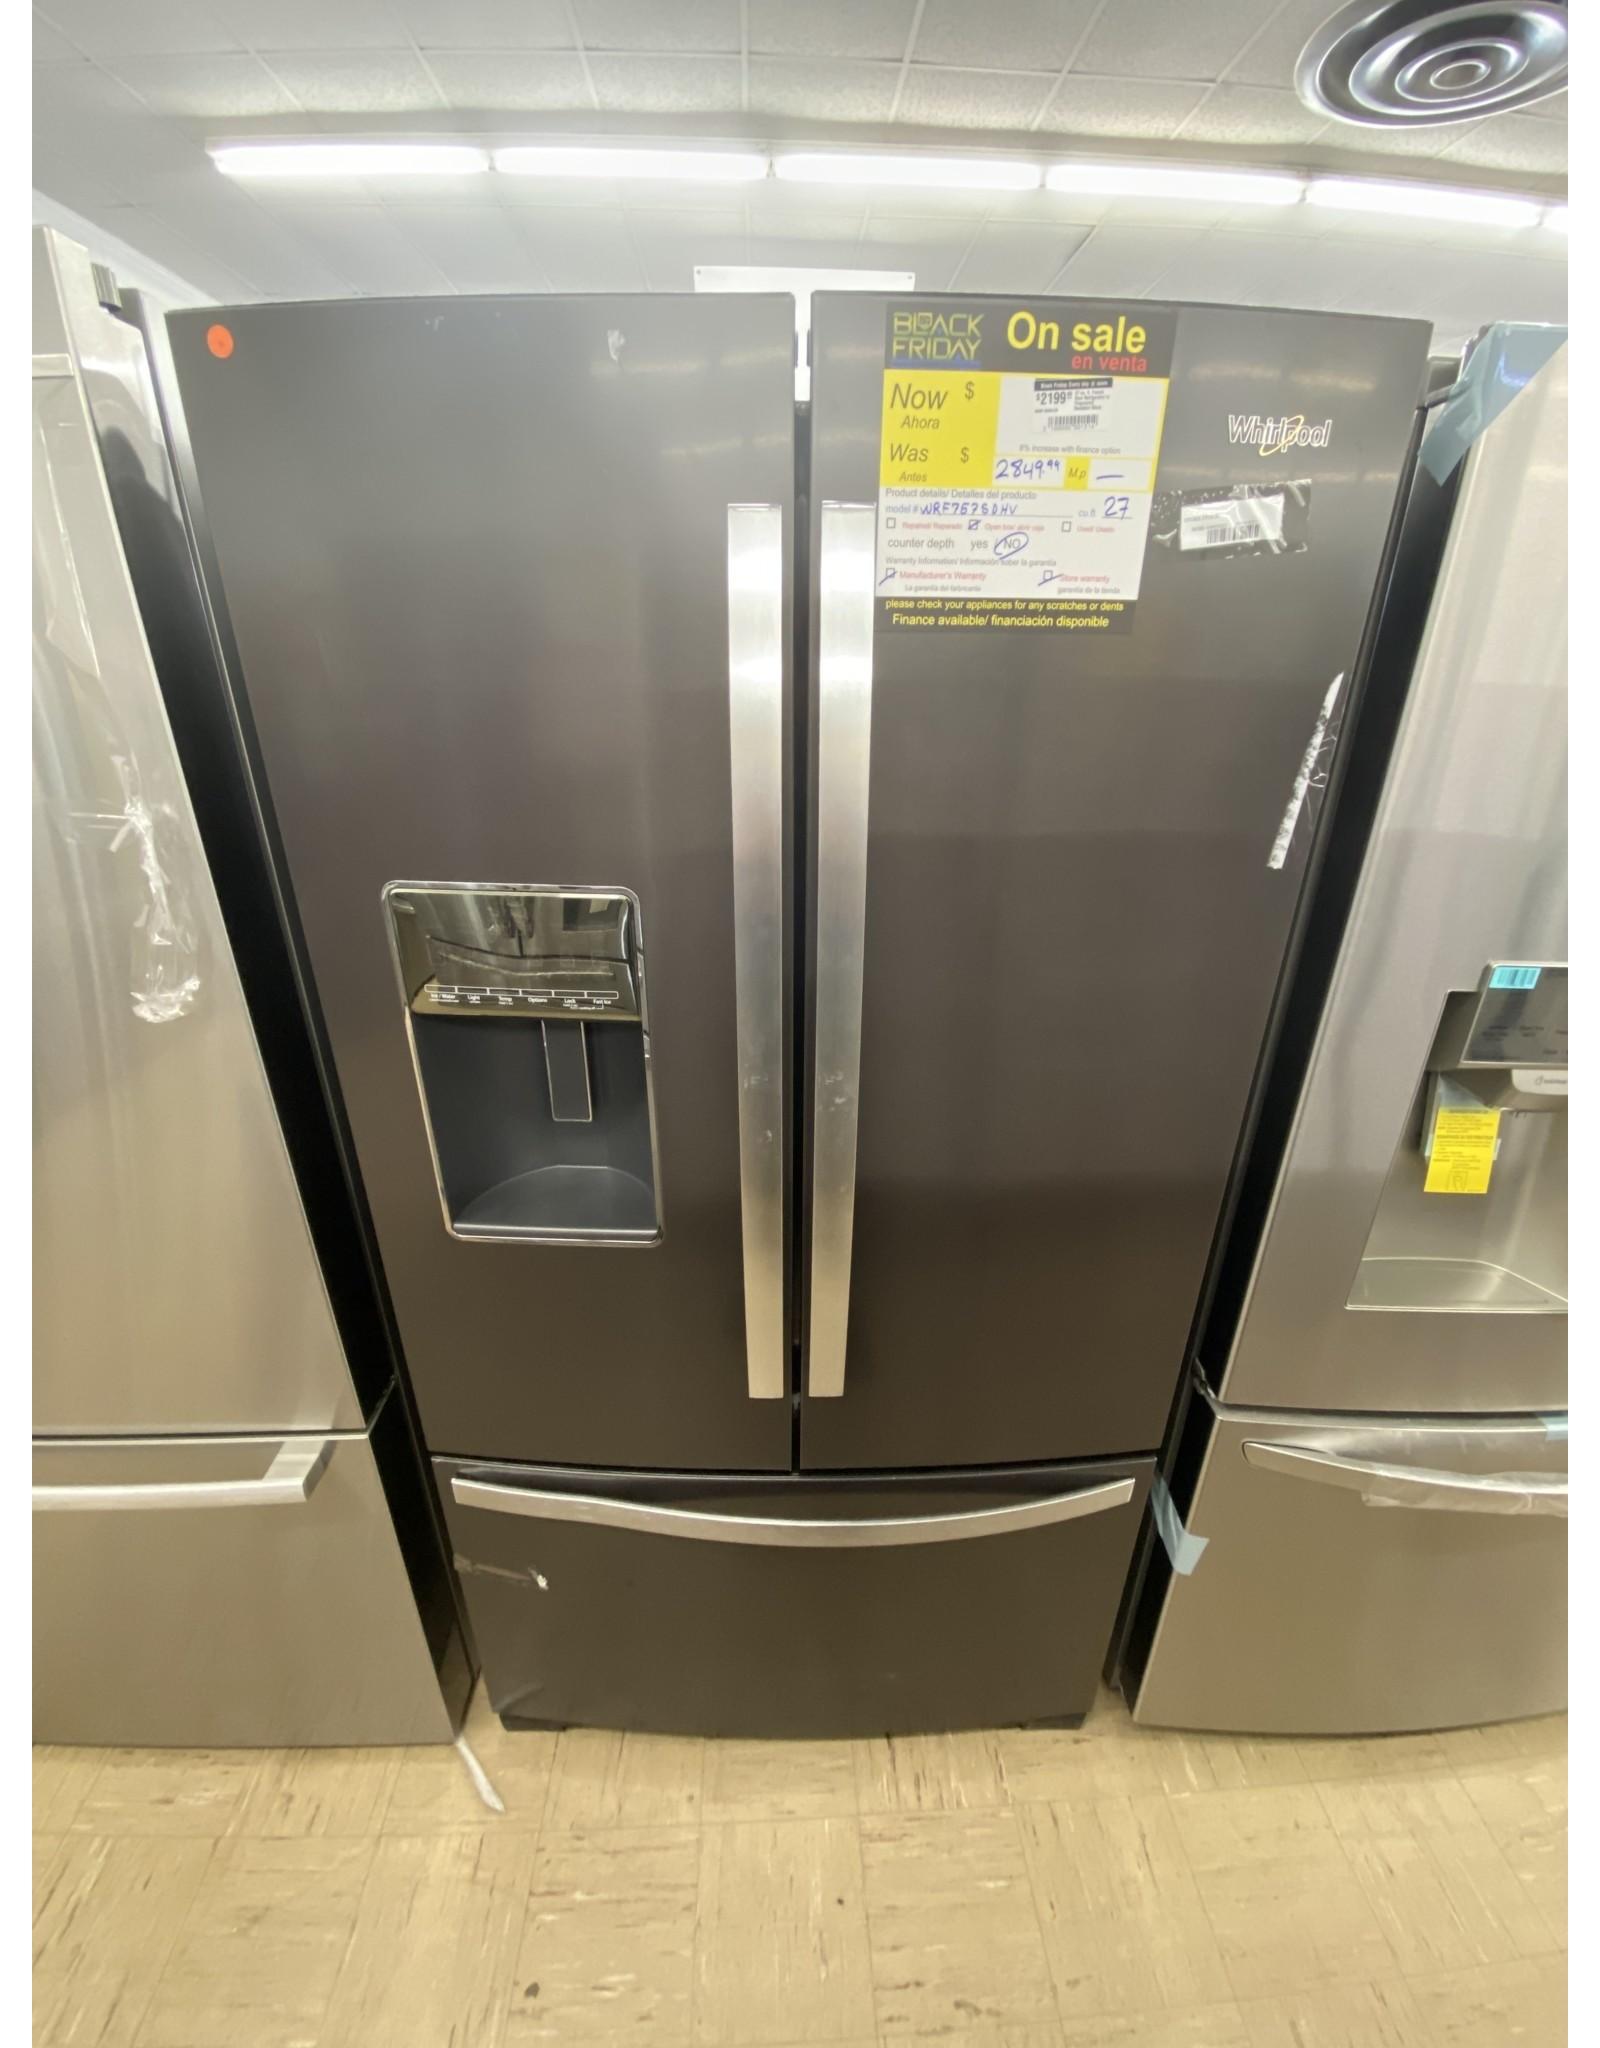 WHIRLPOOL 27 cu. ft. French Door Refrigerator in Fingerprint Resistant Black Stainless